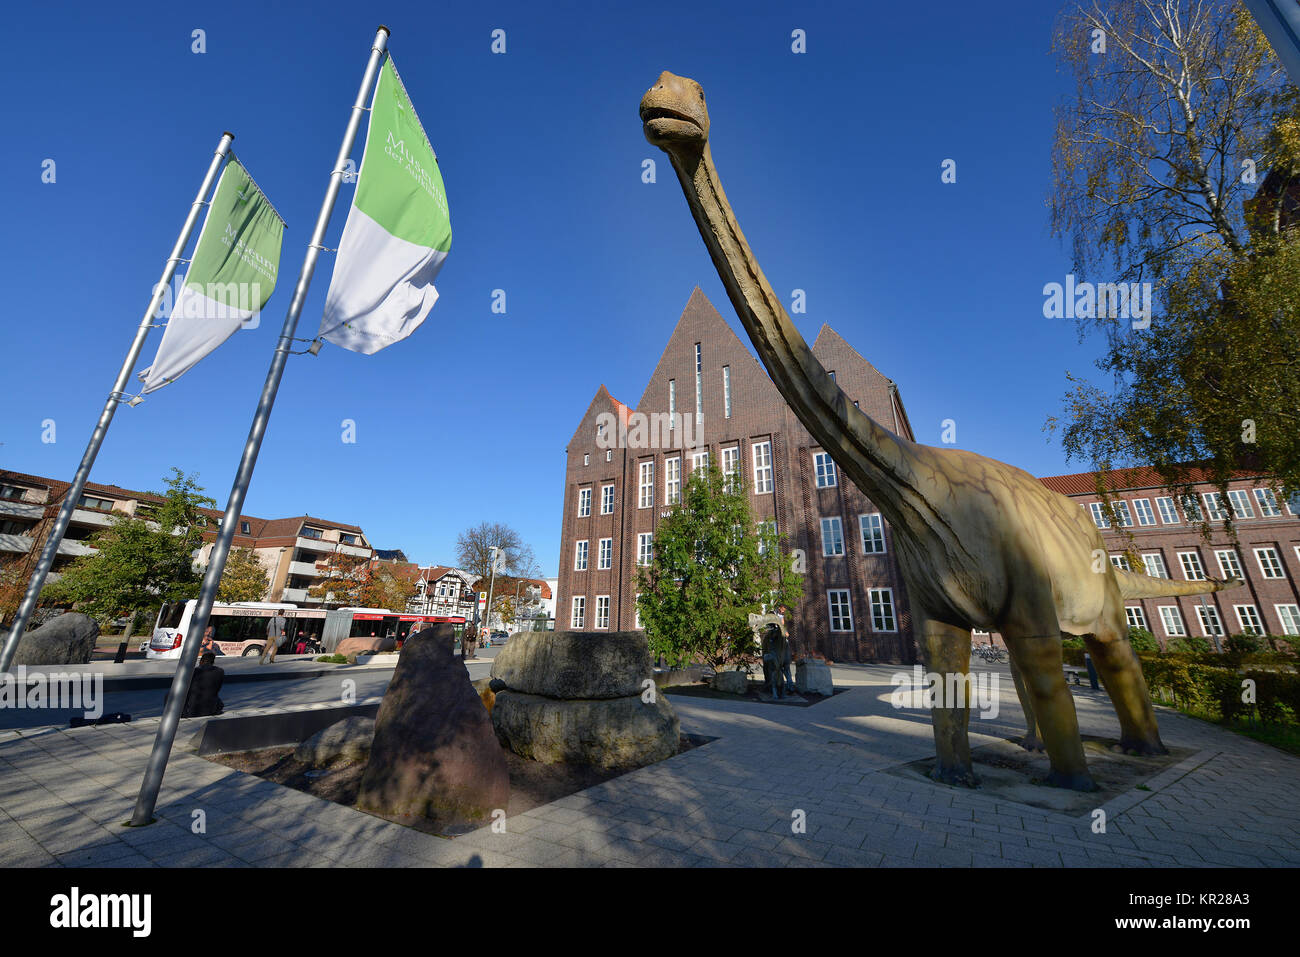 Natural-historical museum, Pockelstrasse, Brunswick, Lower Saxony, Germany, Naturhistorisches Museum, Braunschweig, - Stock Image